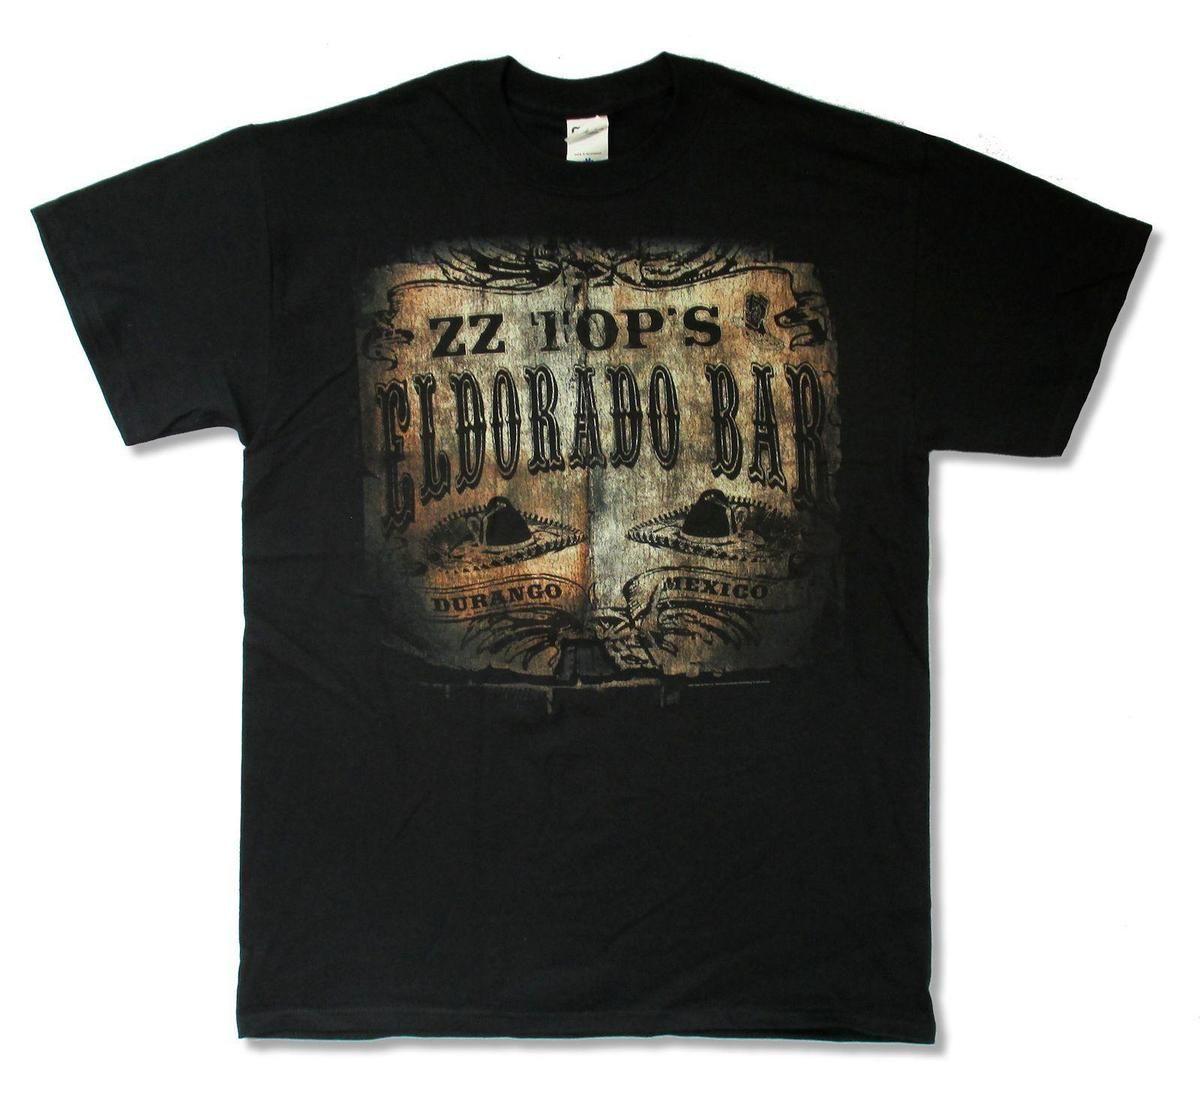 e7da423a2a36fc ZZ TOP EL DORADO BAR TOUR 2013 AR NC BLACK T SHIRT NEW ADULT OFFICIAL Mens  2018 Fashion Brand T Shirt O Neck 100%cotton T Shirt Over Shirt Best T Shirt  Site ...